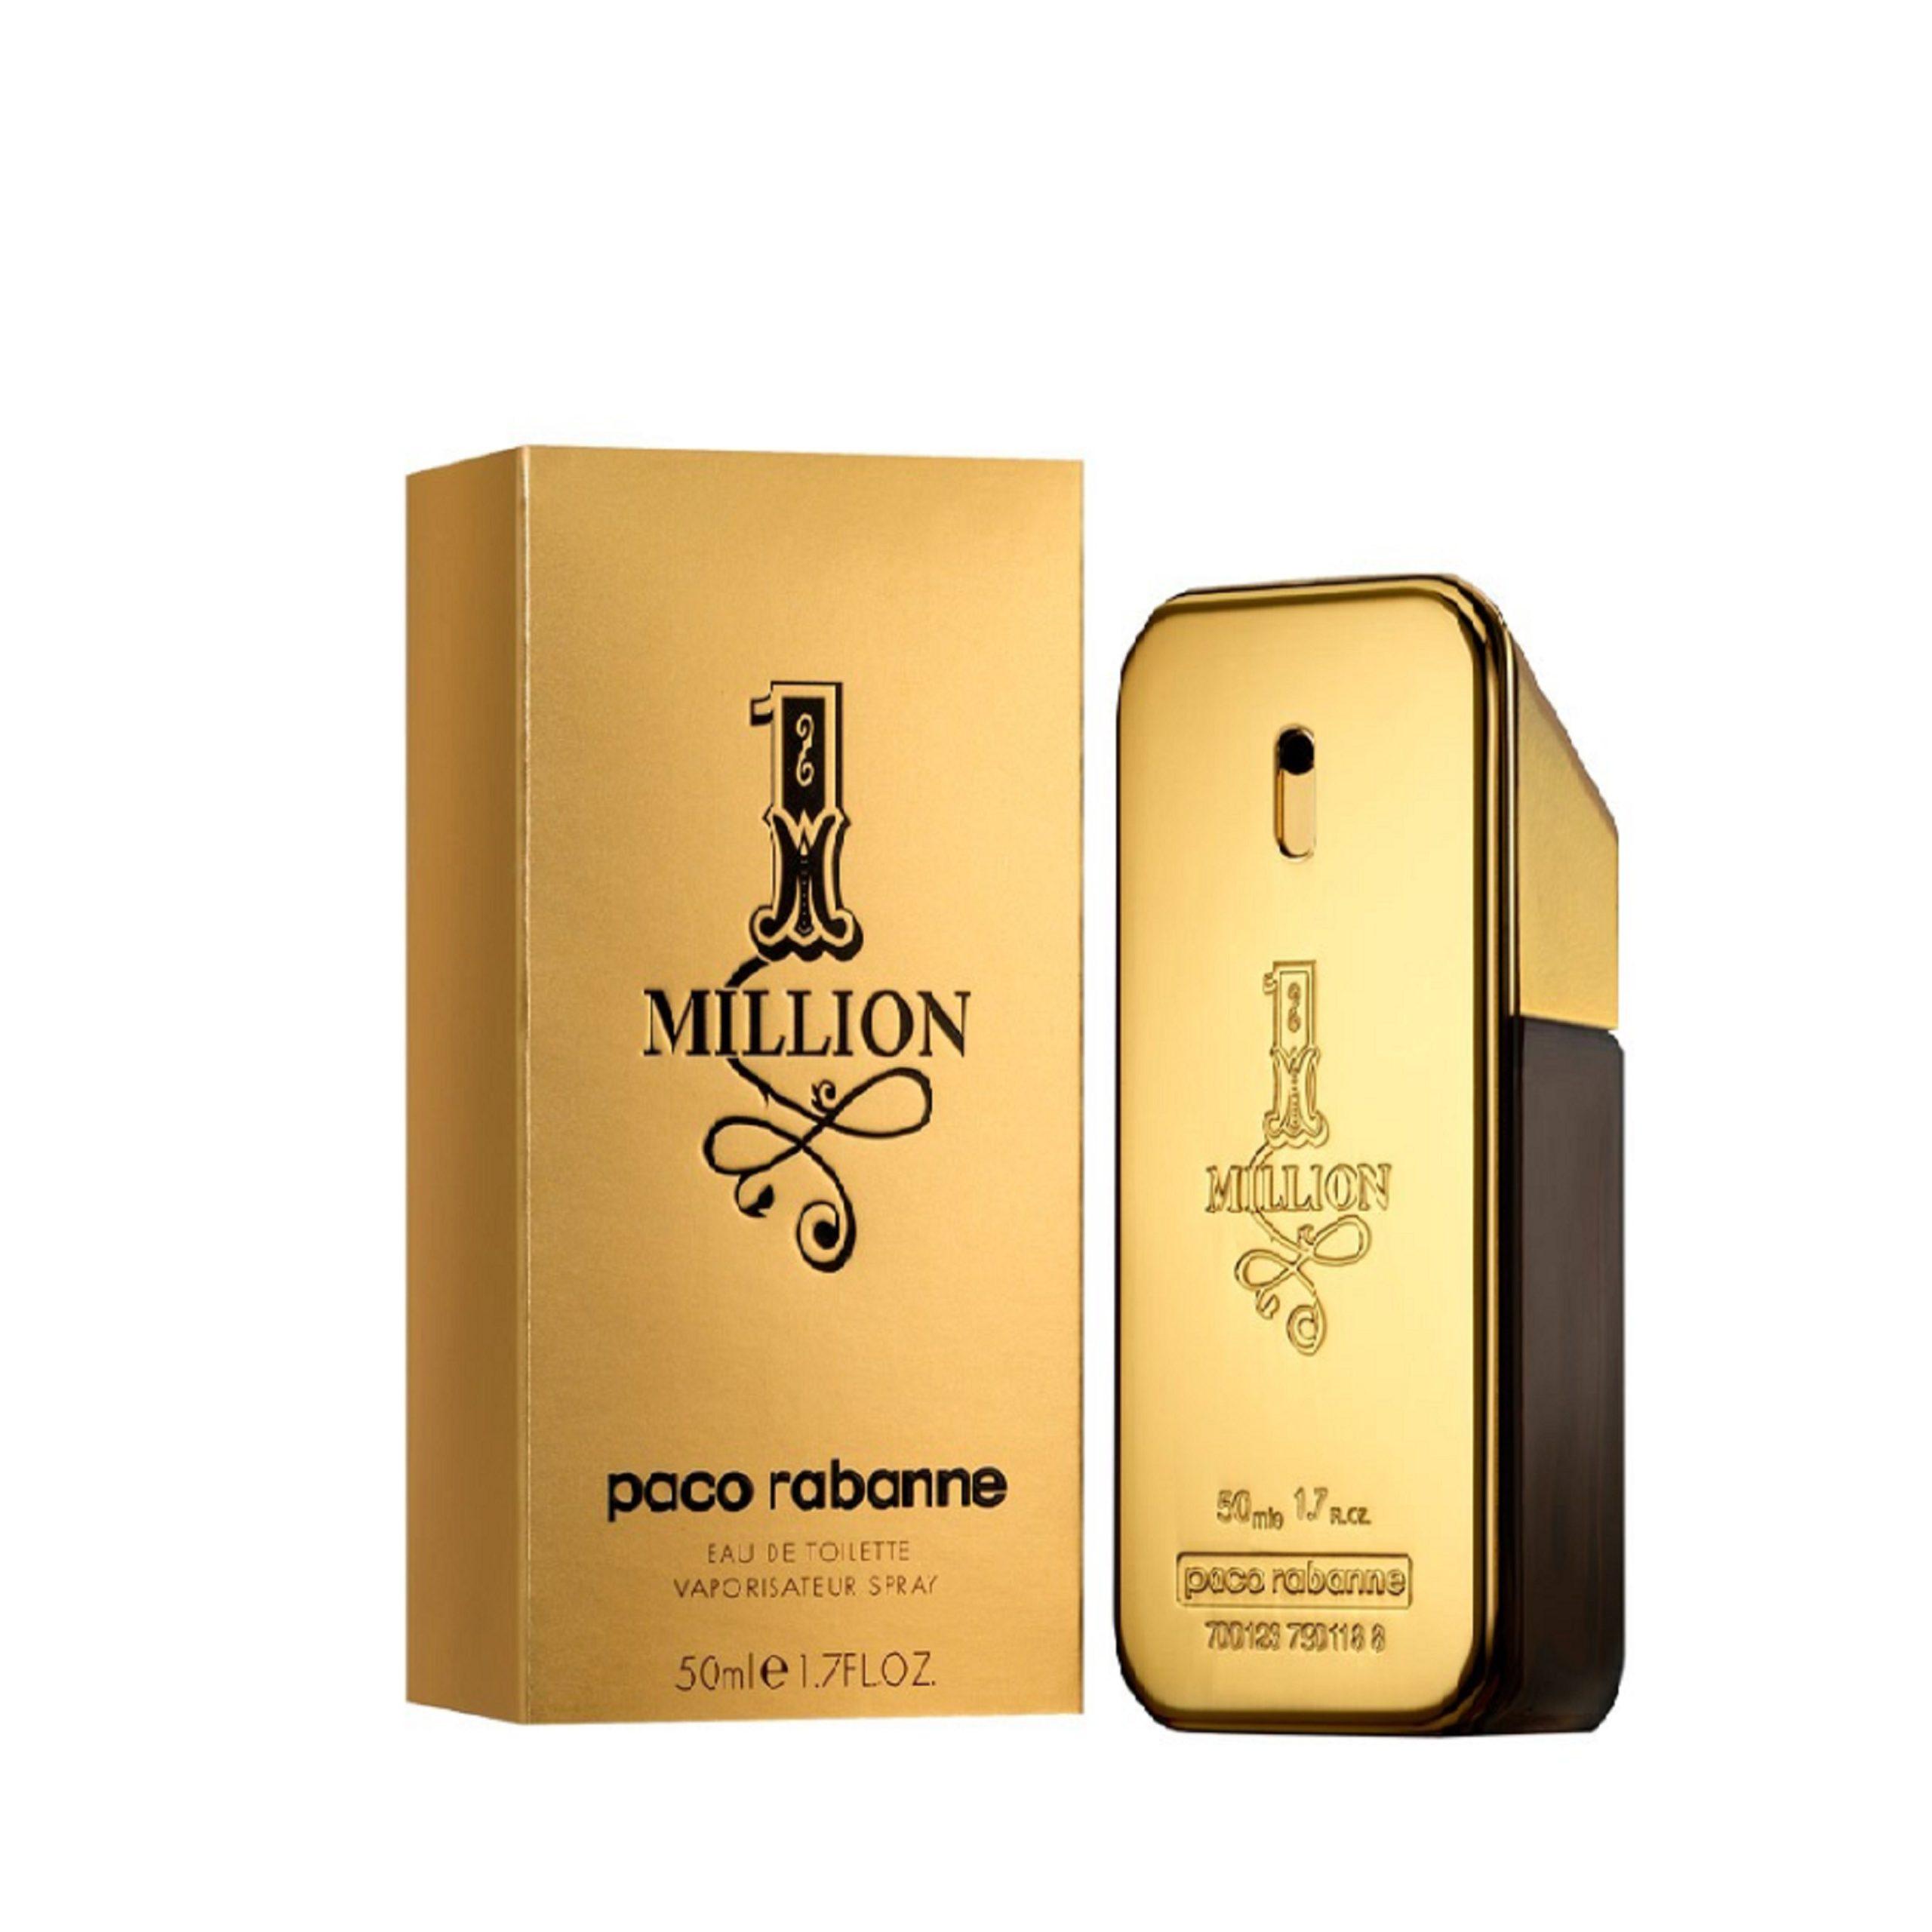 Paco Raban 1 Million 50ml